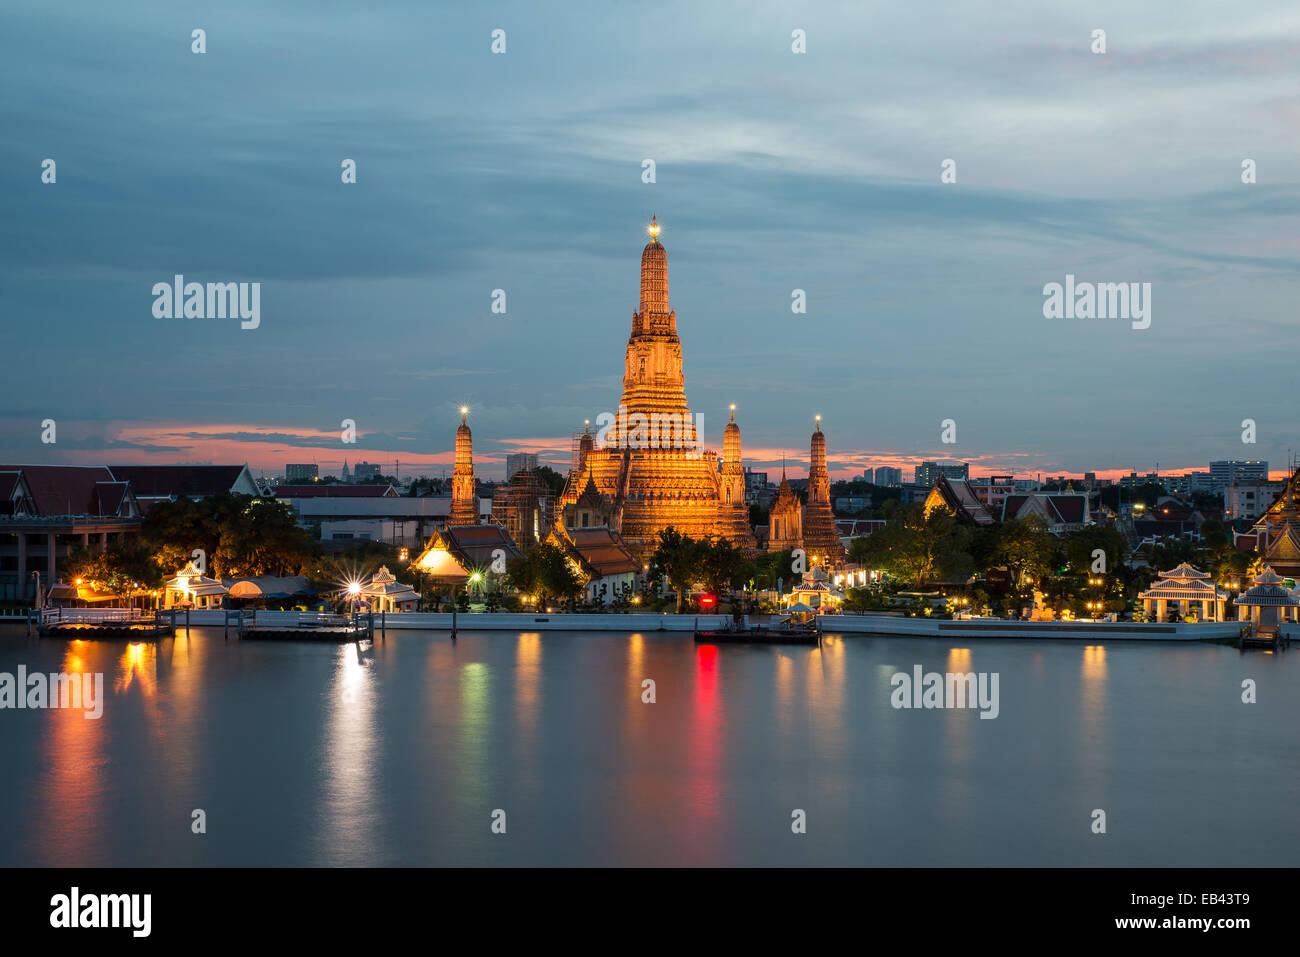 Wat Arun buddista luoghi religiosi in Twilight time, Bangkok, Thailandia Immagini Stock